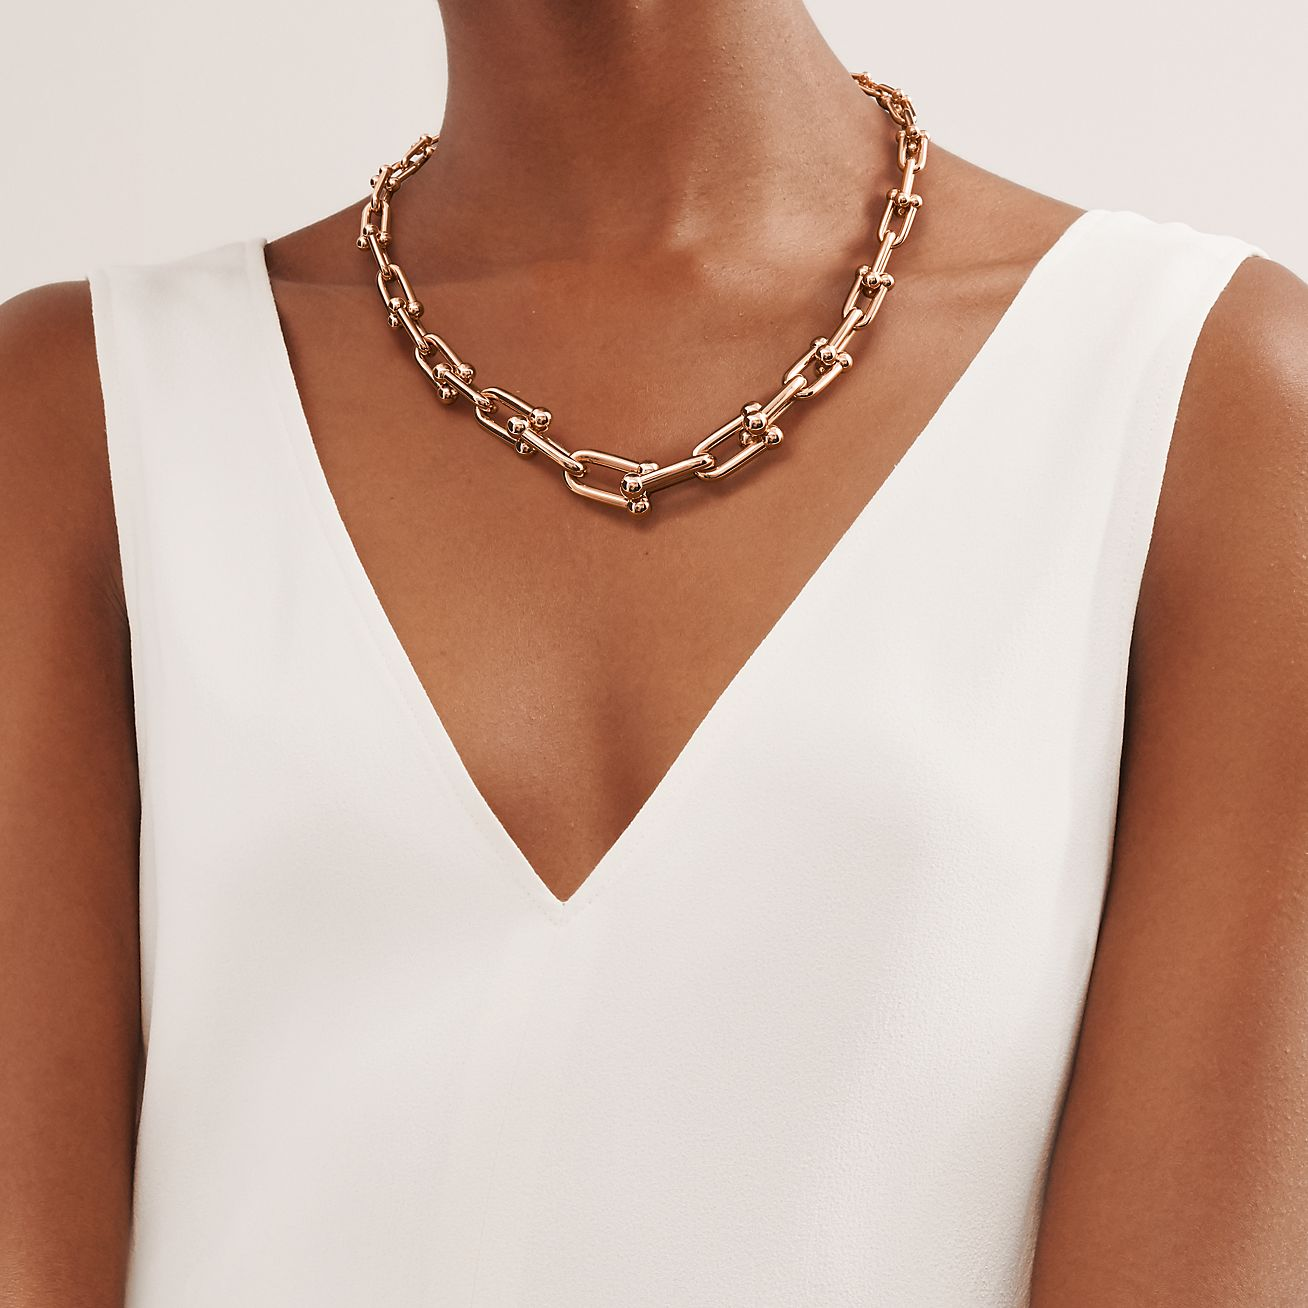 Tiffany Hardwear Graduated Link Necklace In 18k Rose Gold Tiffany Co